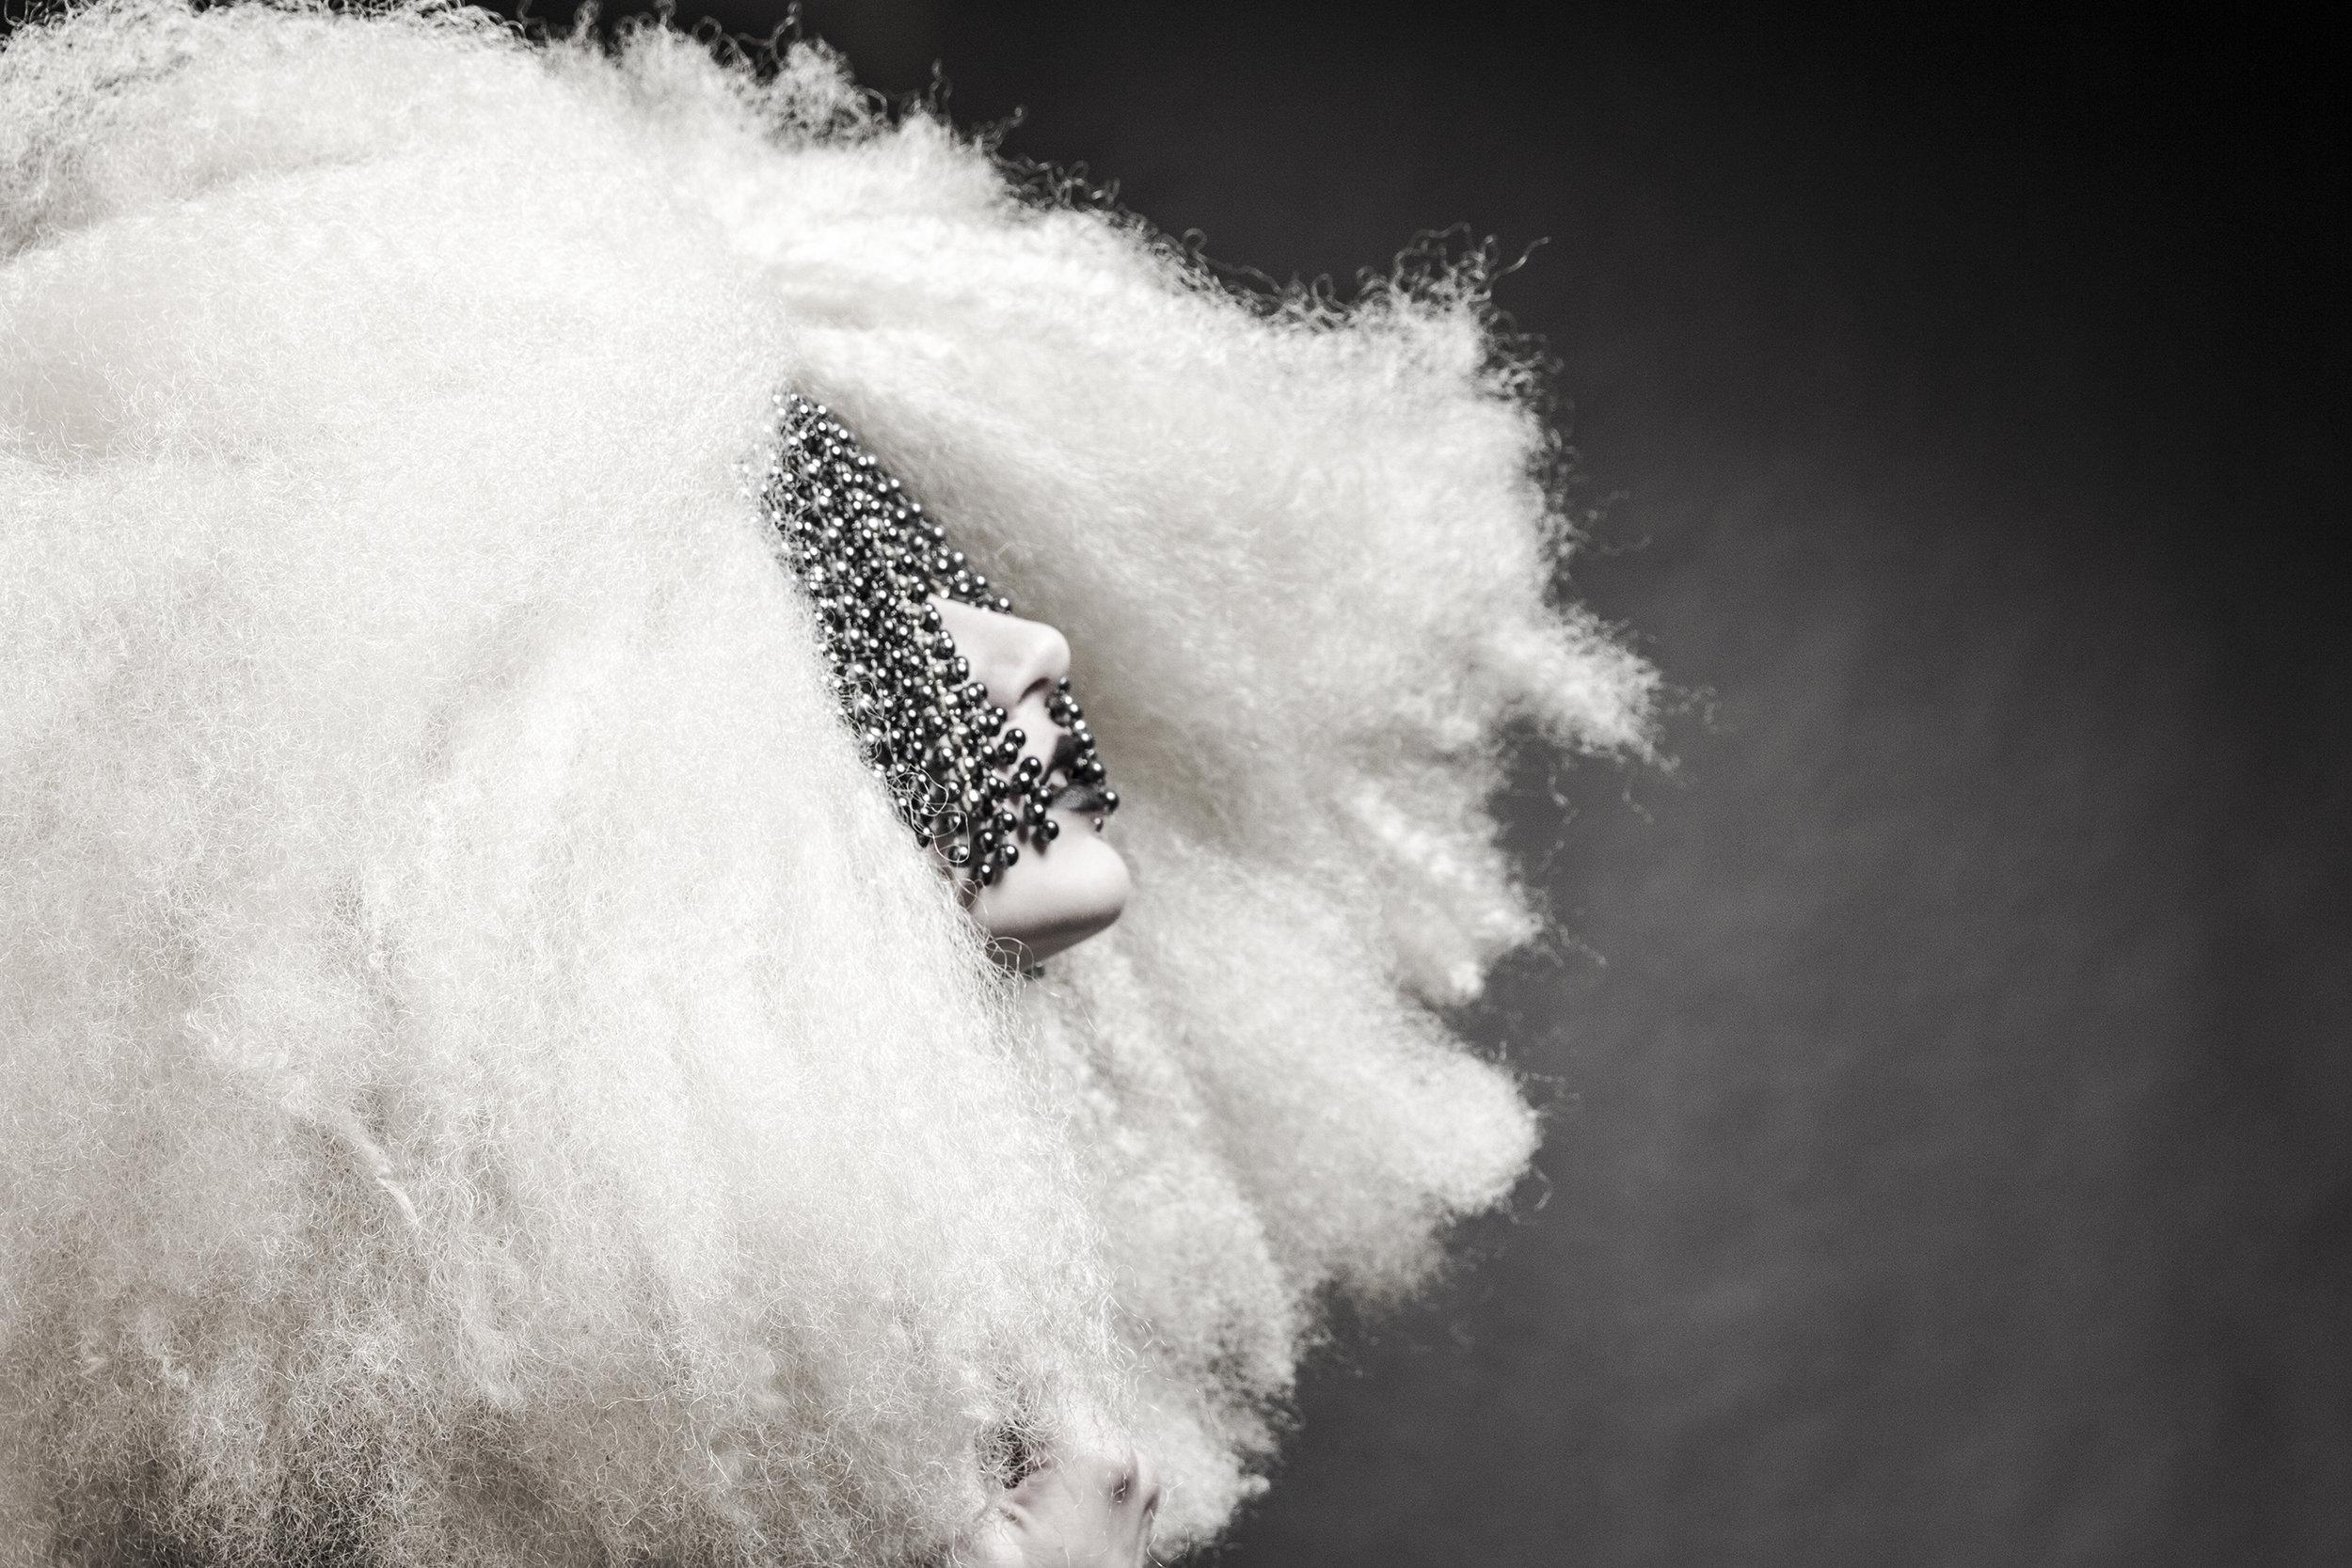 fashion-edgy-editorial-dark-gothic-bighair-platinum-blonde-moody-leather-sleek-black-beuty-hombre-makeup-redlip03.jpg